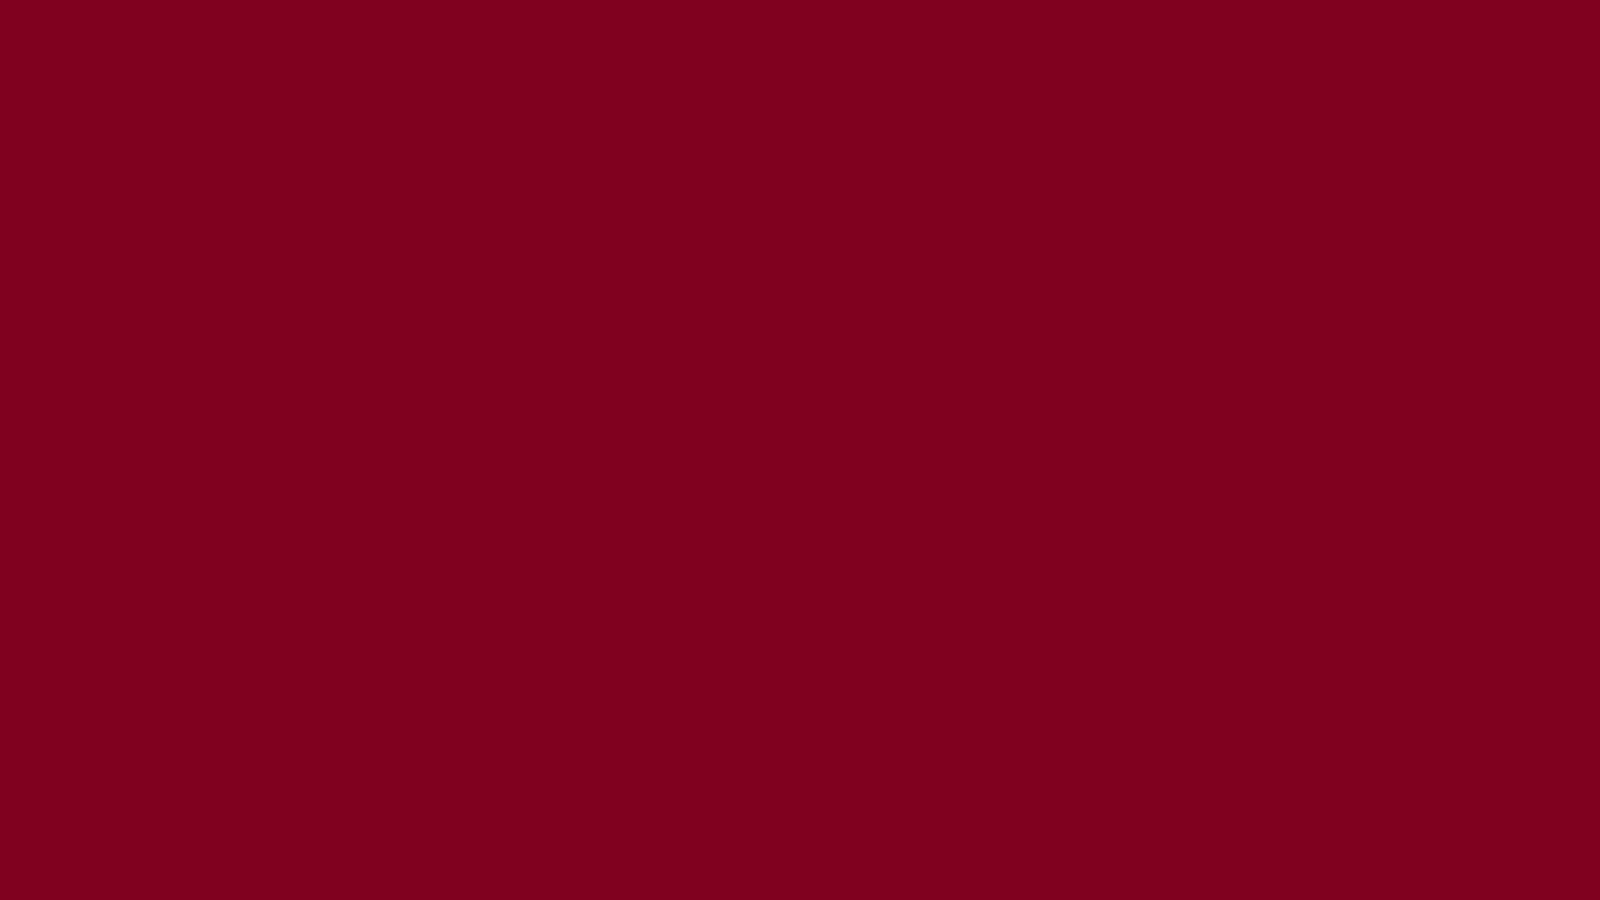 1600x900 Burgundy Solid Color Background